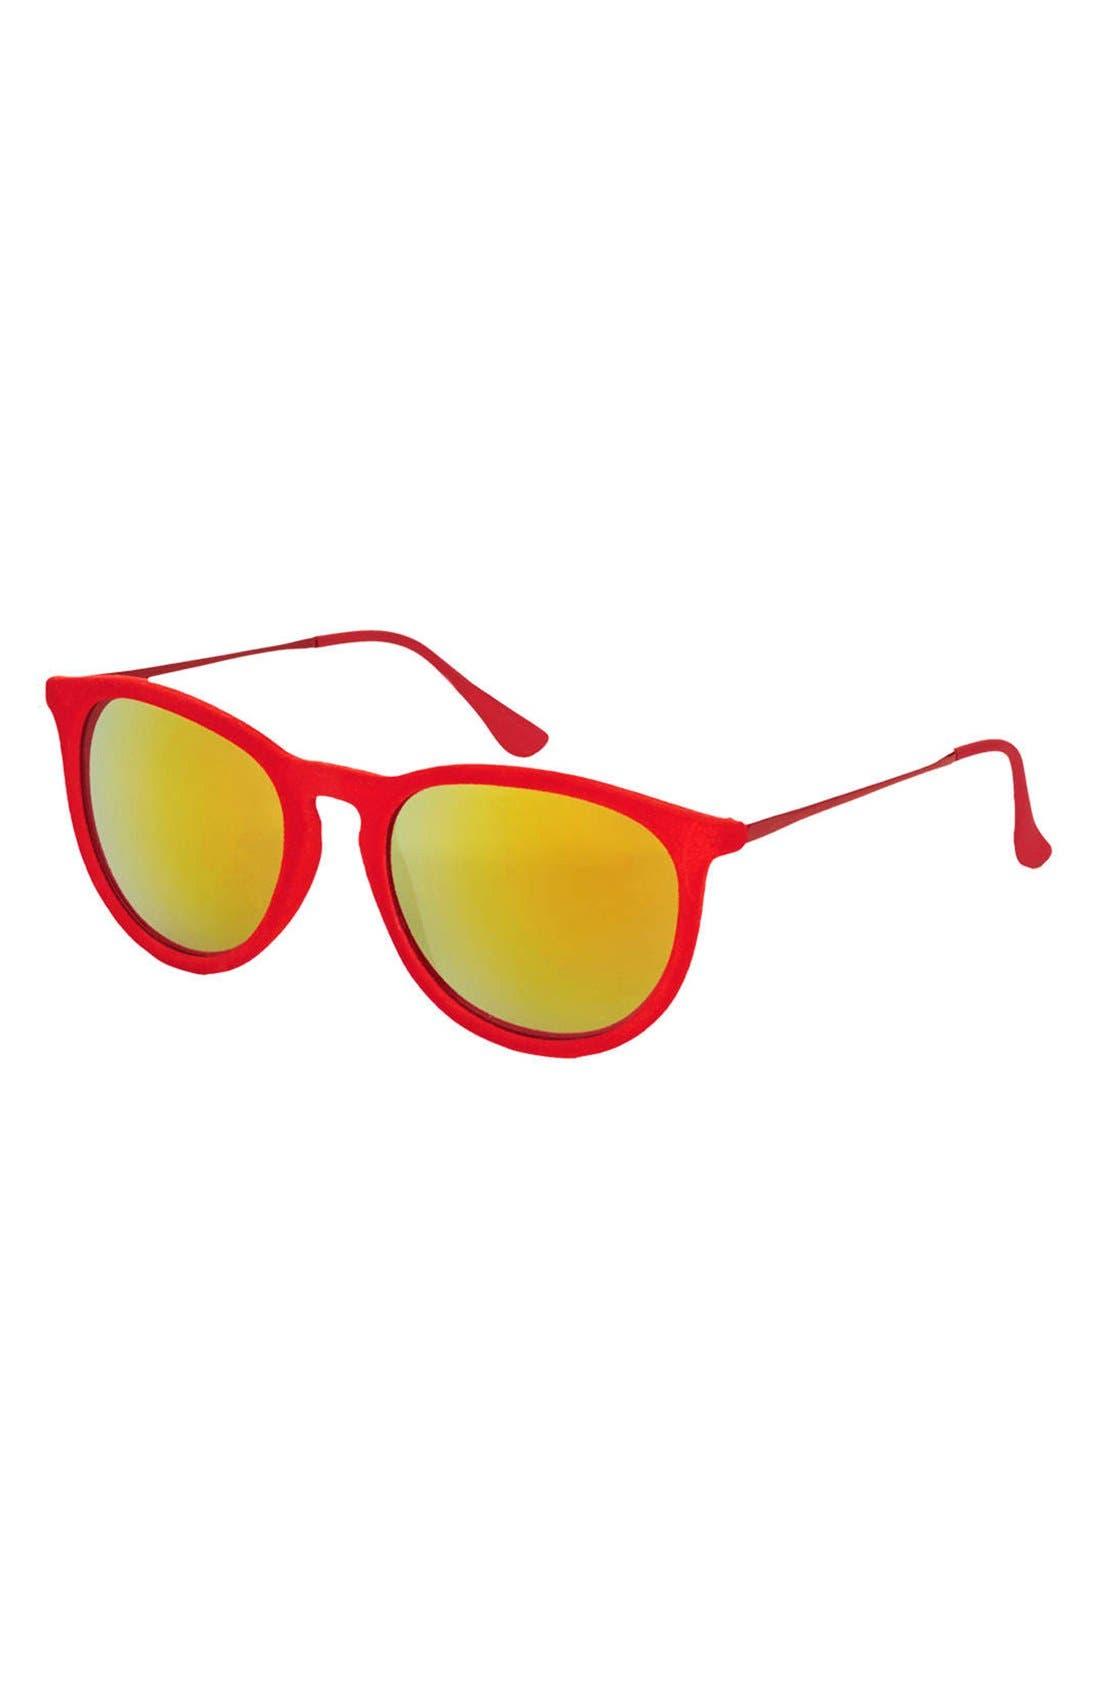 Alternate Image 1 Selected - Topshop 'Revo' 53mm Velour Sunglasses